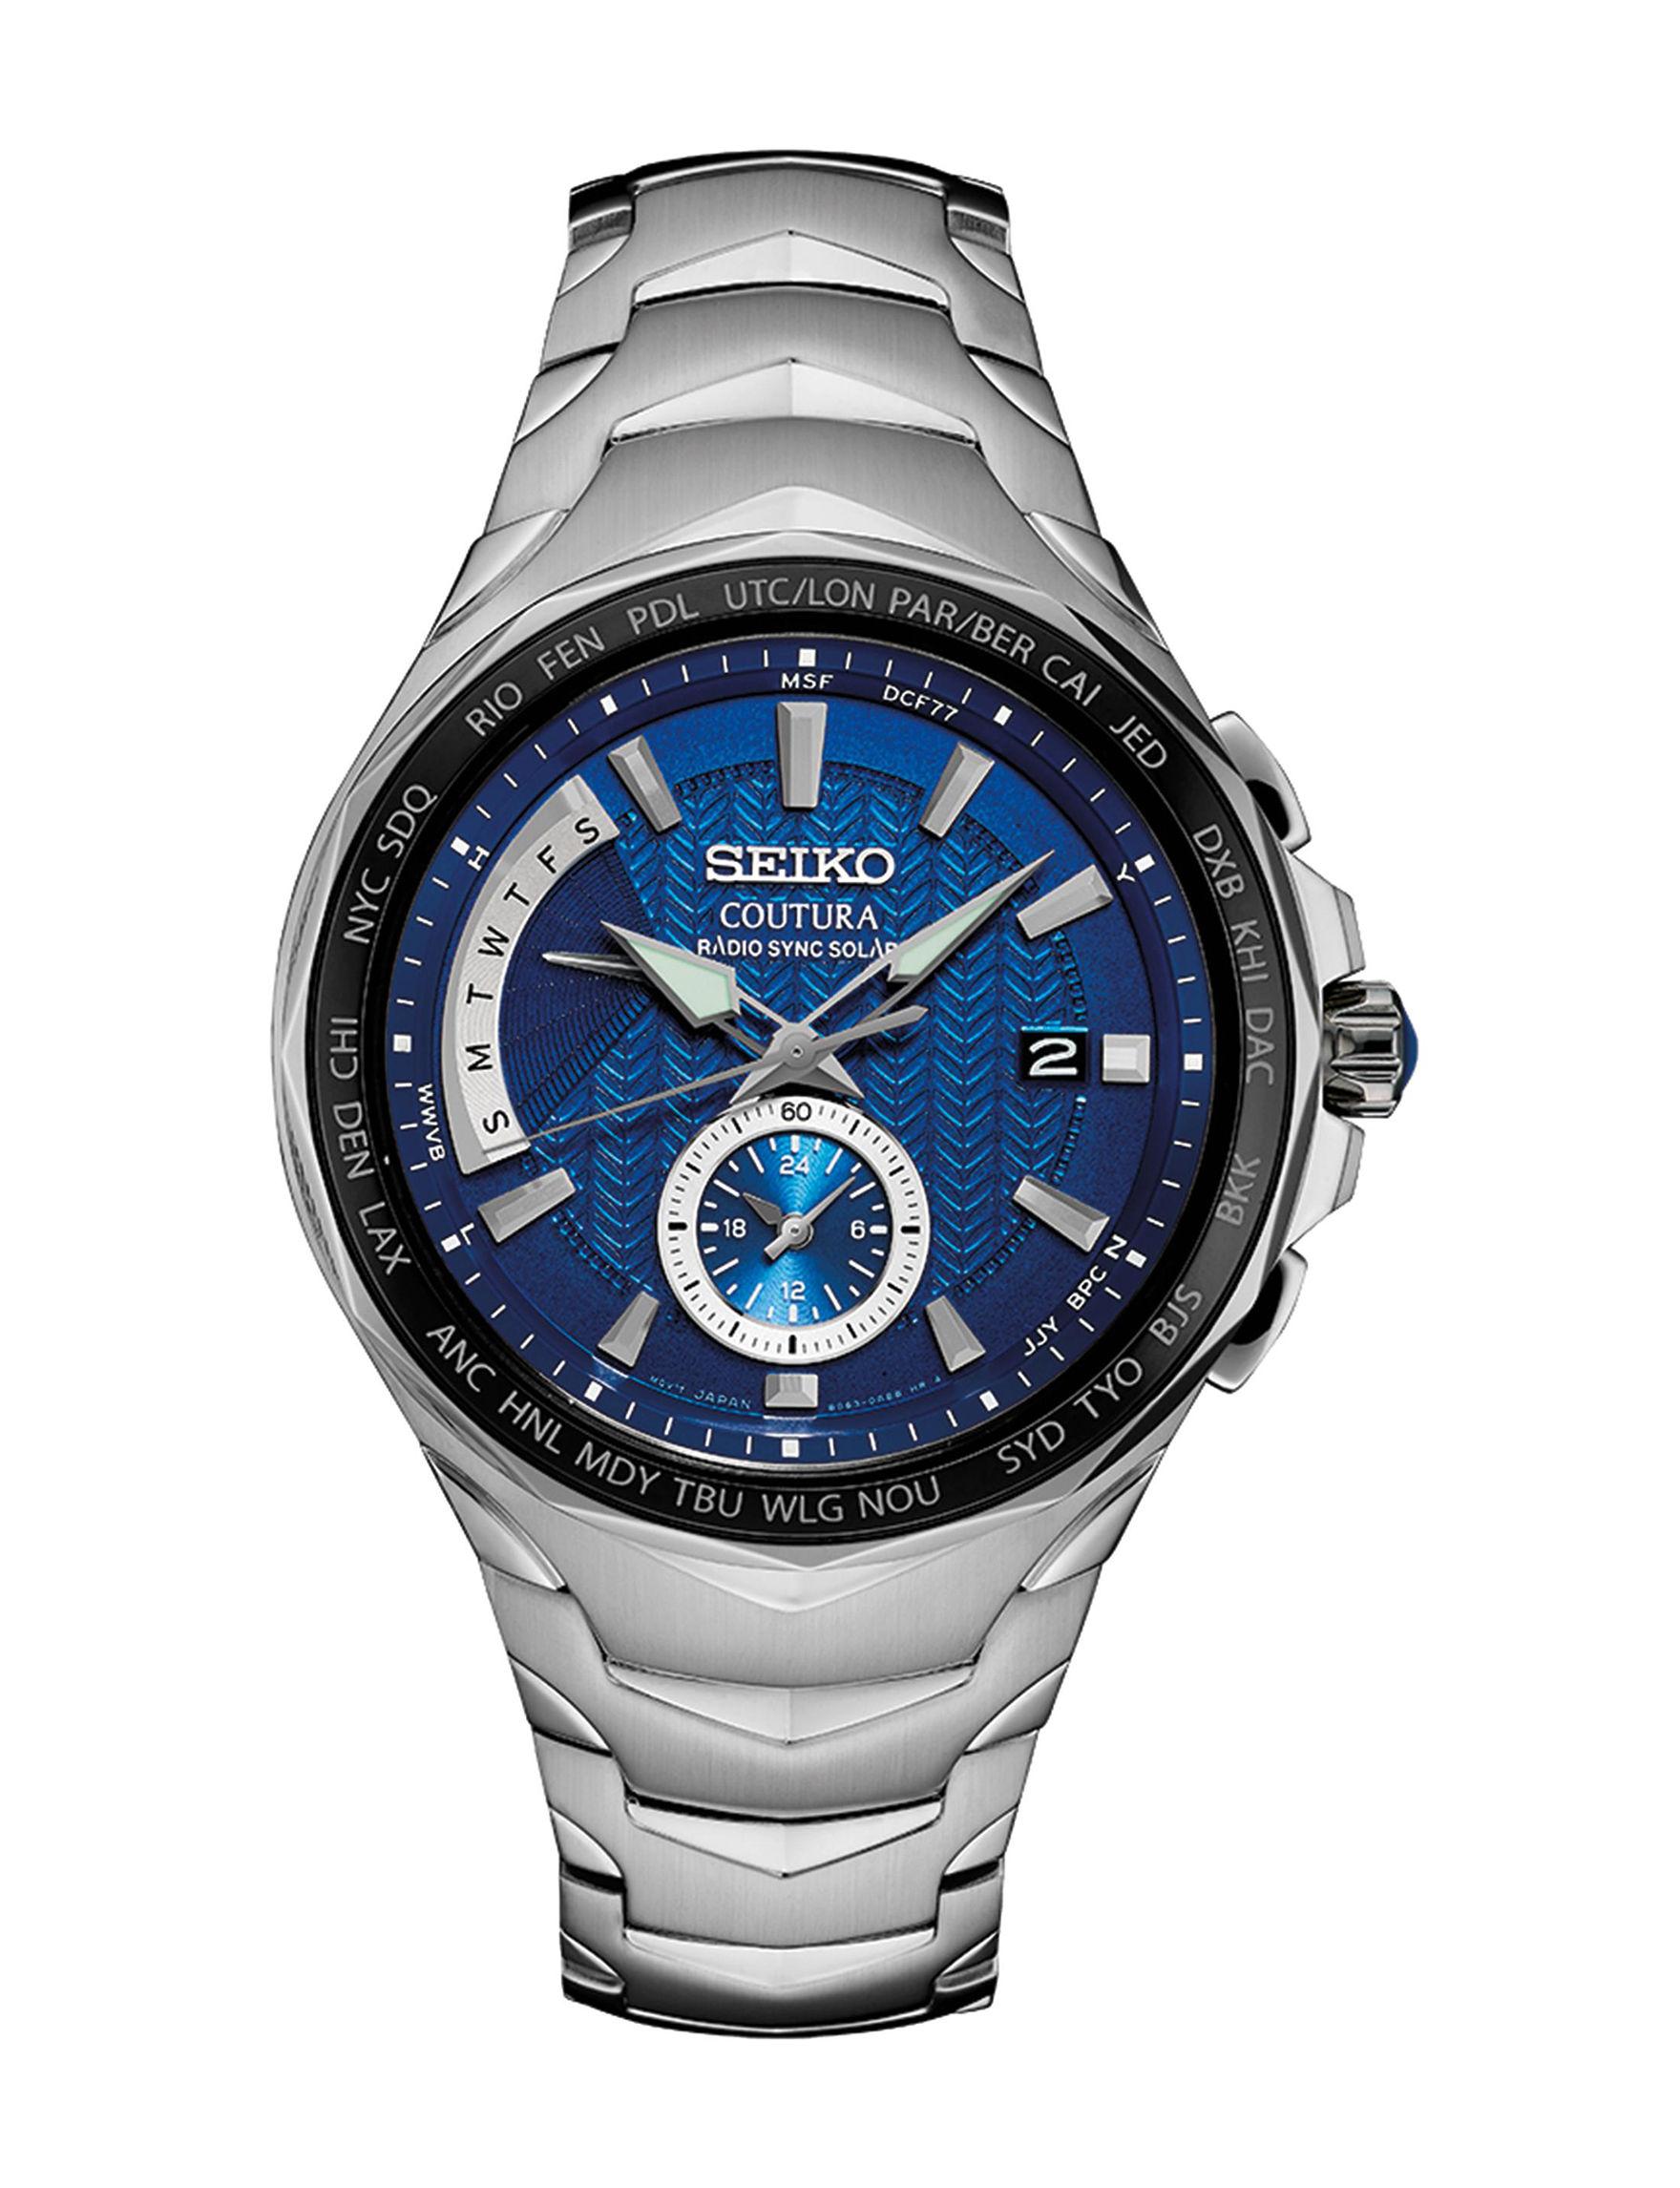 Seiko Silver Fashion Watches Accessories